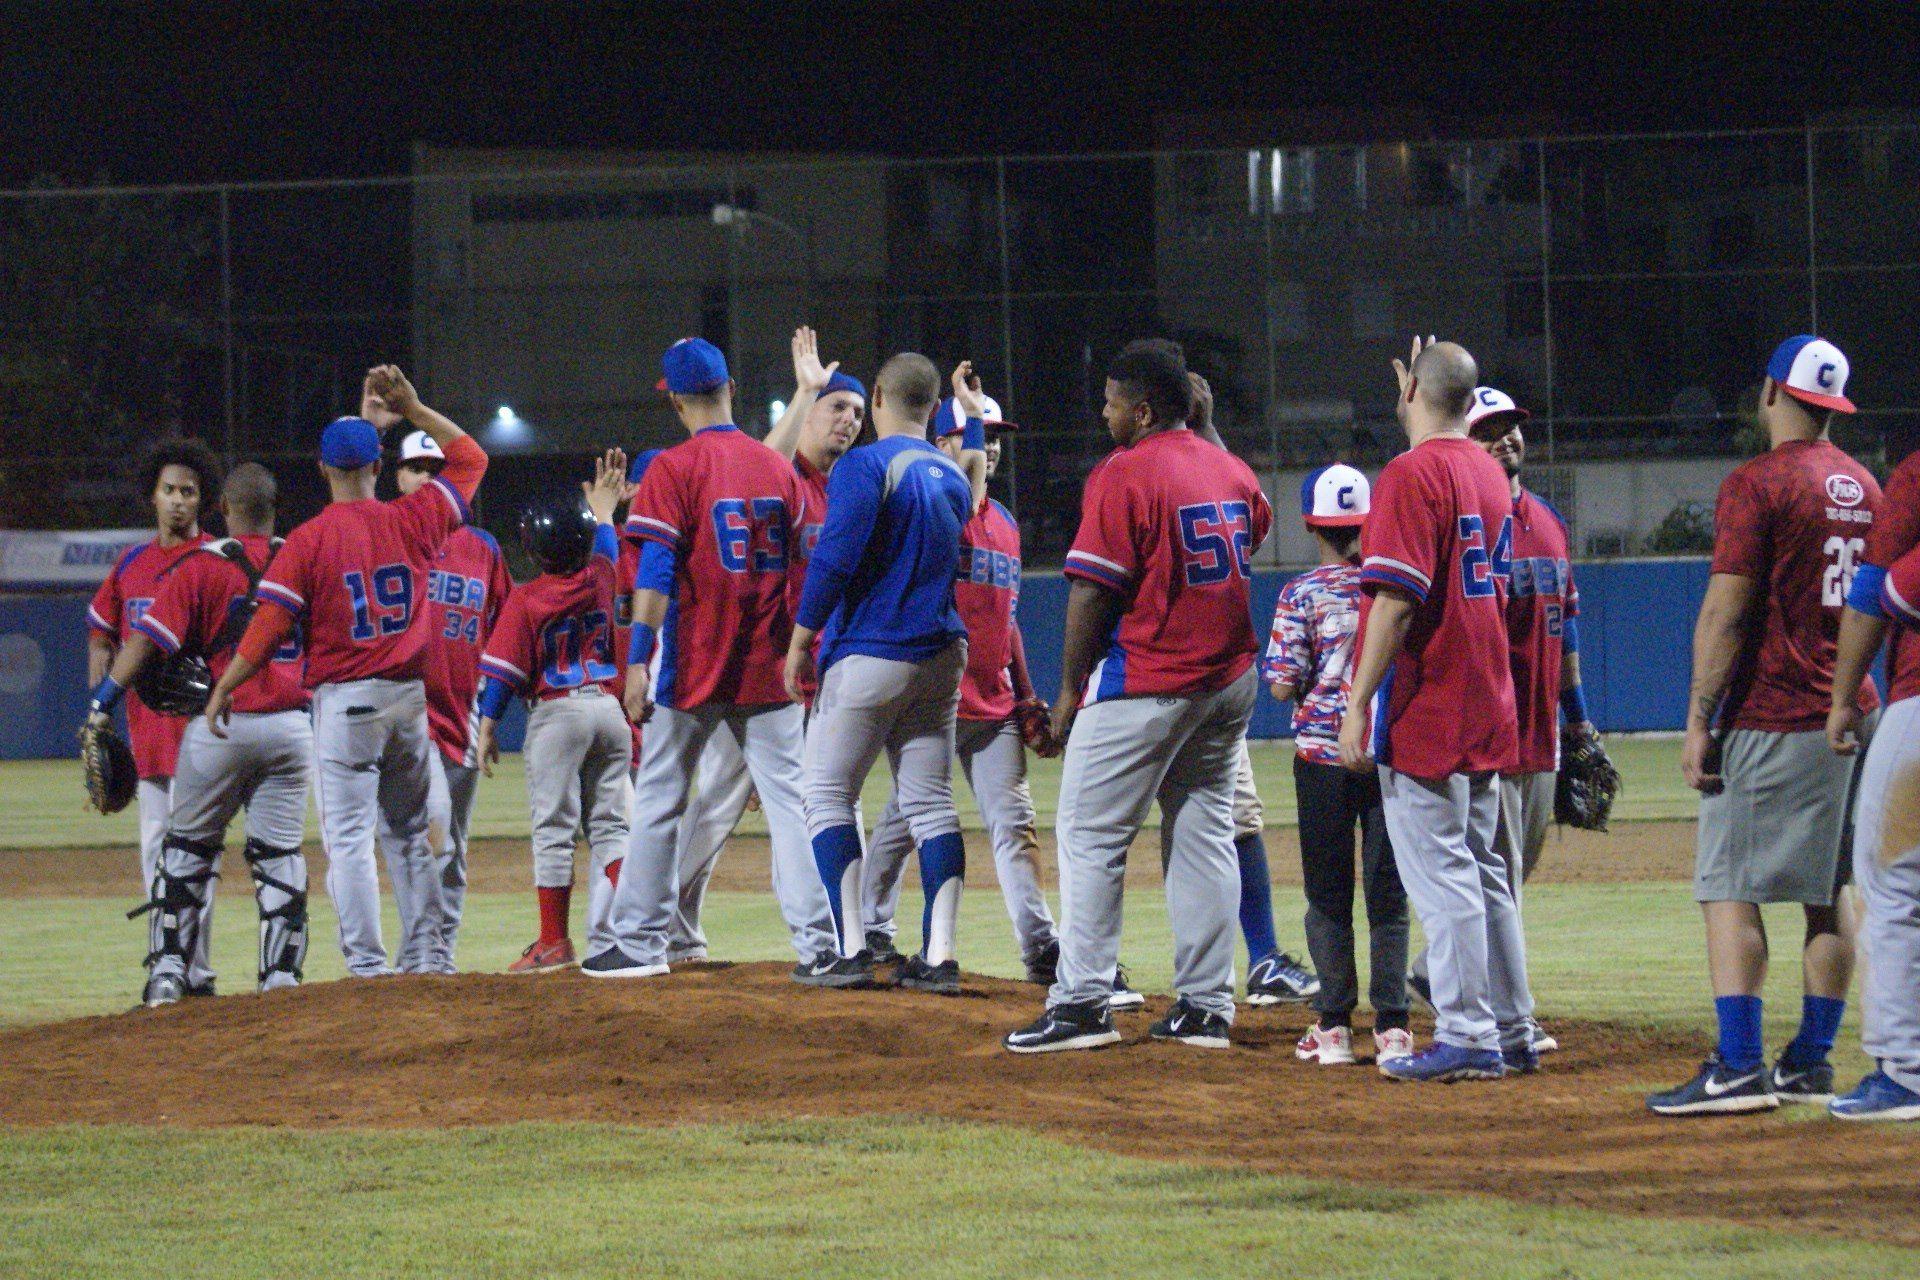 Dominan Accion Del Viernes Ceiba Maunabo Yabucoa Y Orocovis Pagina Oficial Coliceba Triple A Baseball League League Baseball